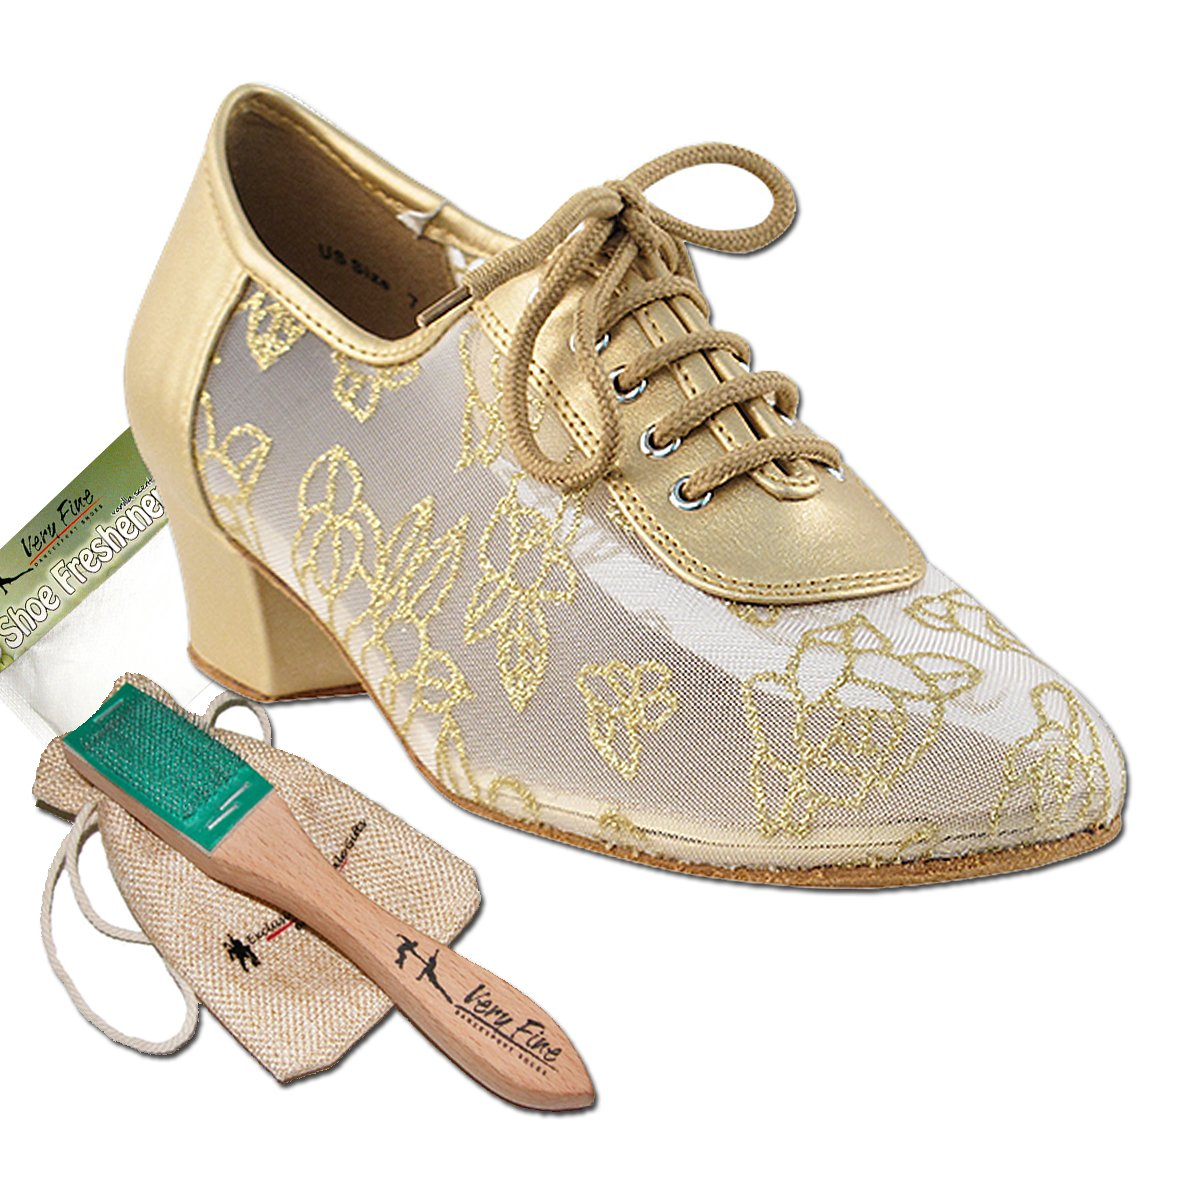 Women's Ballroom Dance Shoes Salsa Latin Practice Dance Shoes Light Gold Leather 2002EB Comfortable - Very Fine 1.5'' Heel 9 M US [Bundle of 5]